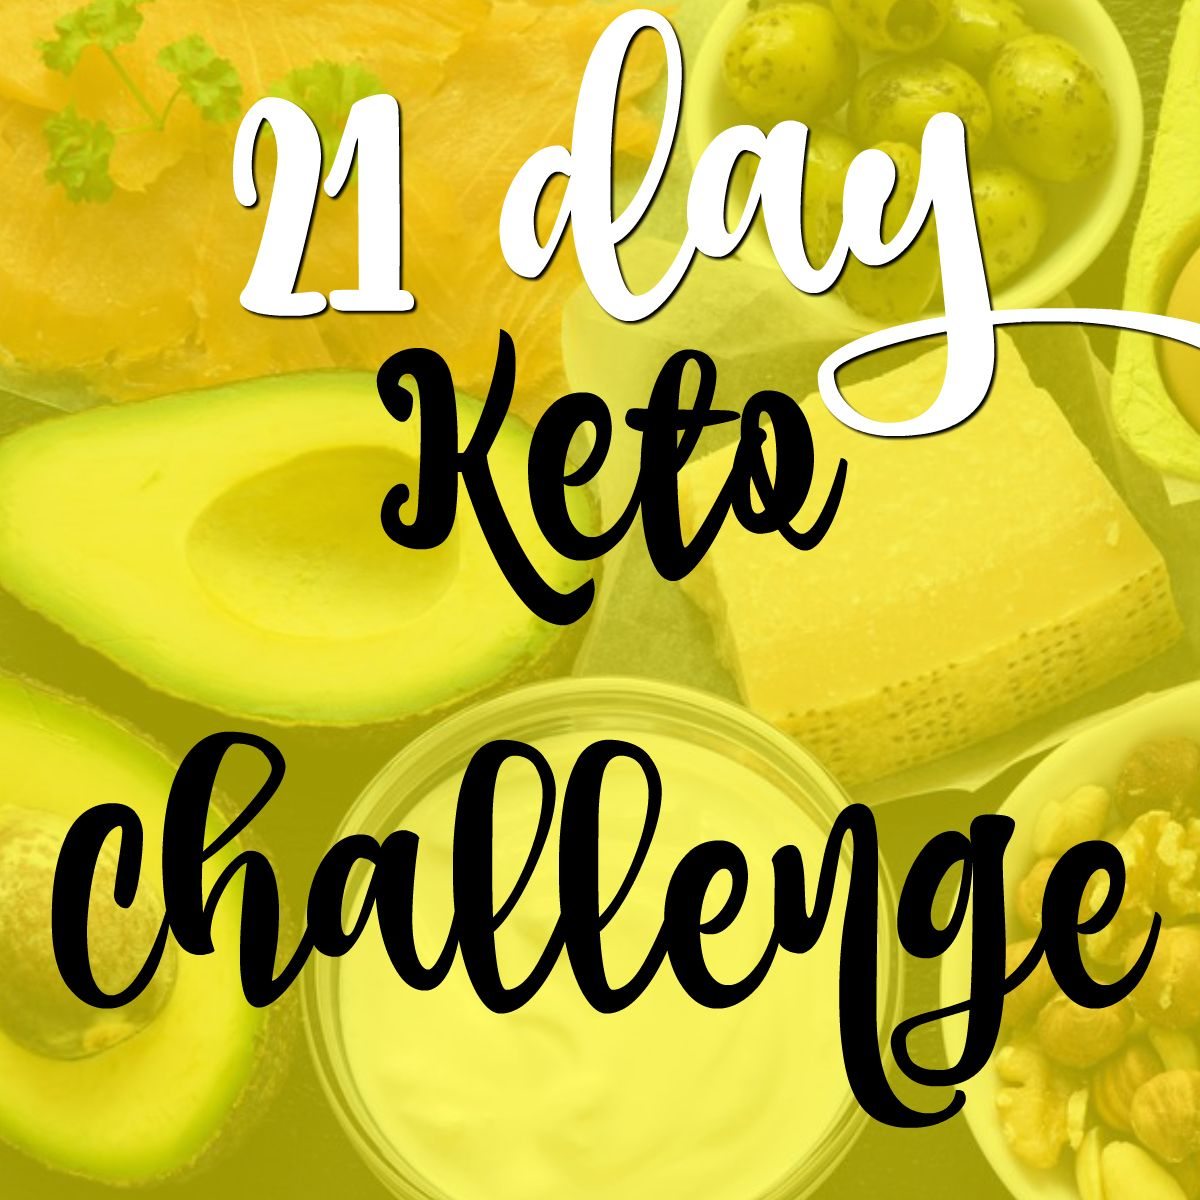 21 Day Keto Diet Plan Keto Keto Diet Side Effects Keto Diet Plan